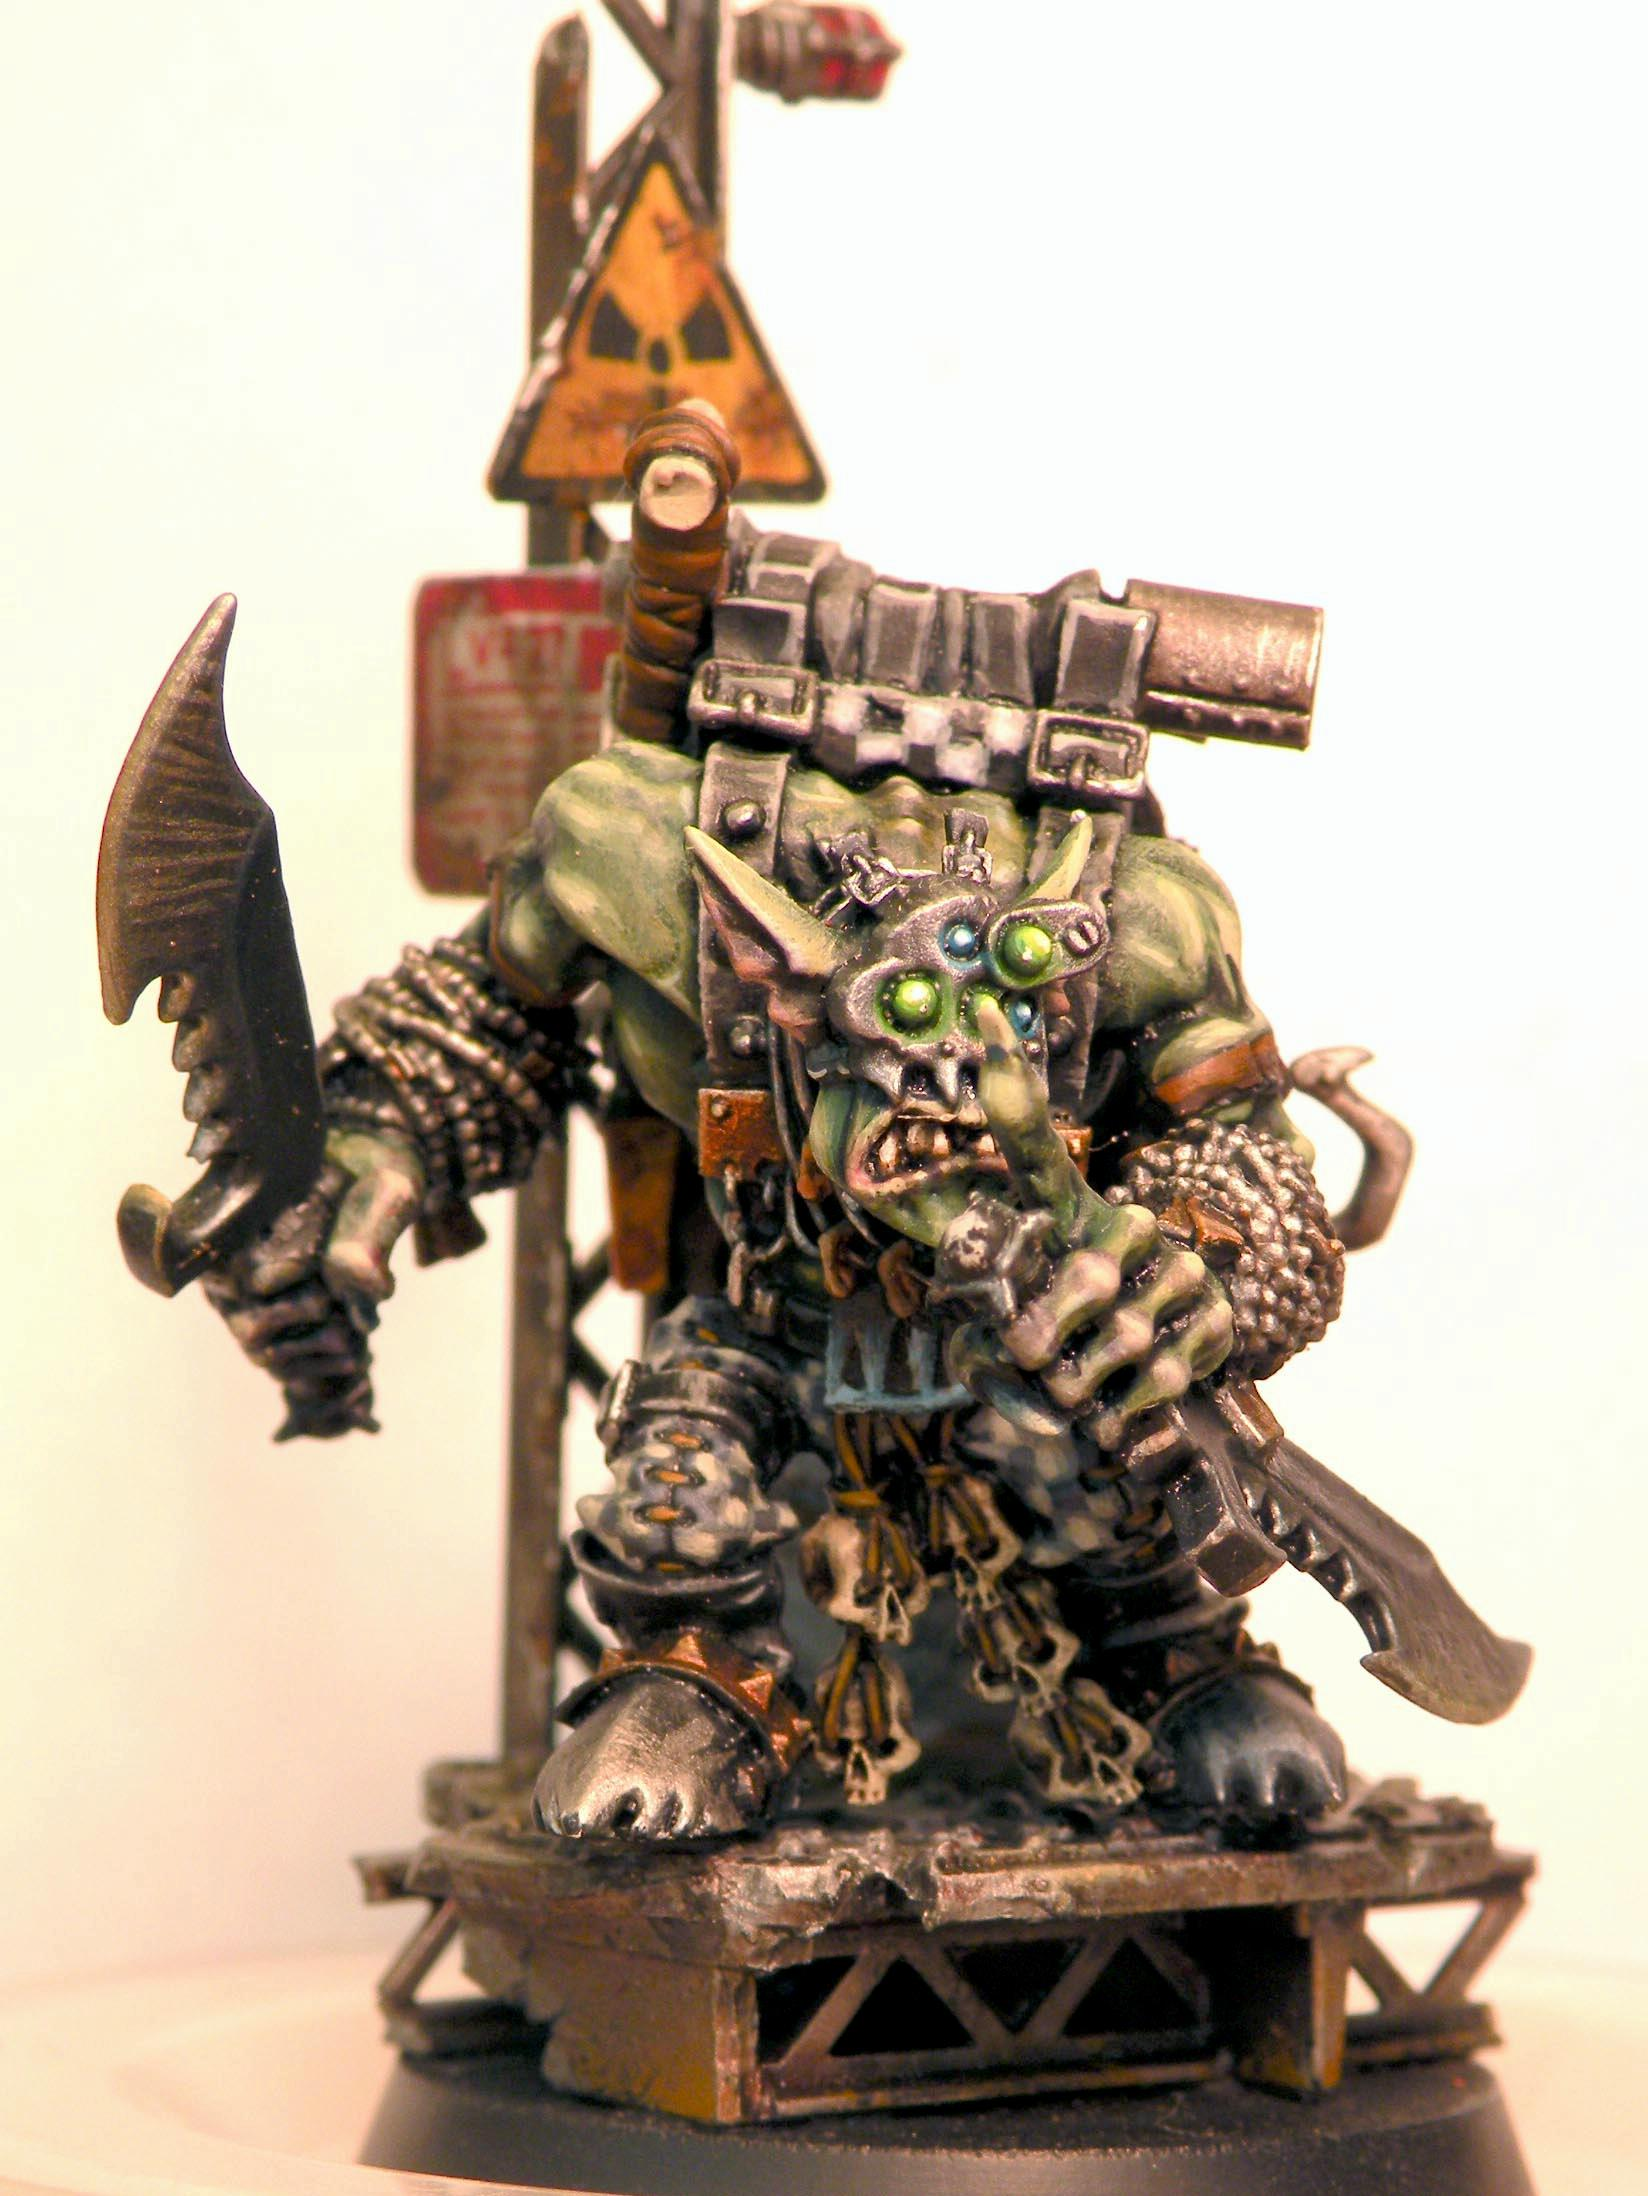 Kommandos, Orks, Snikrot, Special Character, Warhammer 40,000